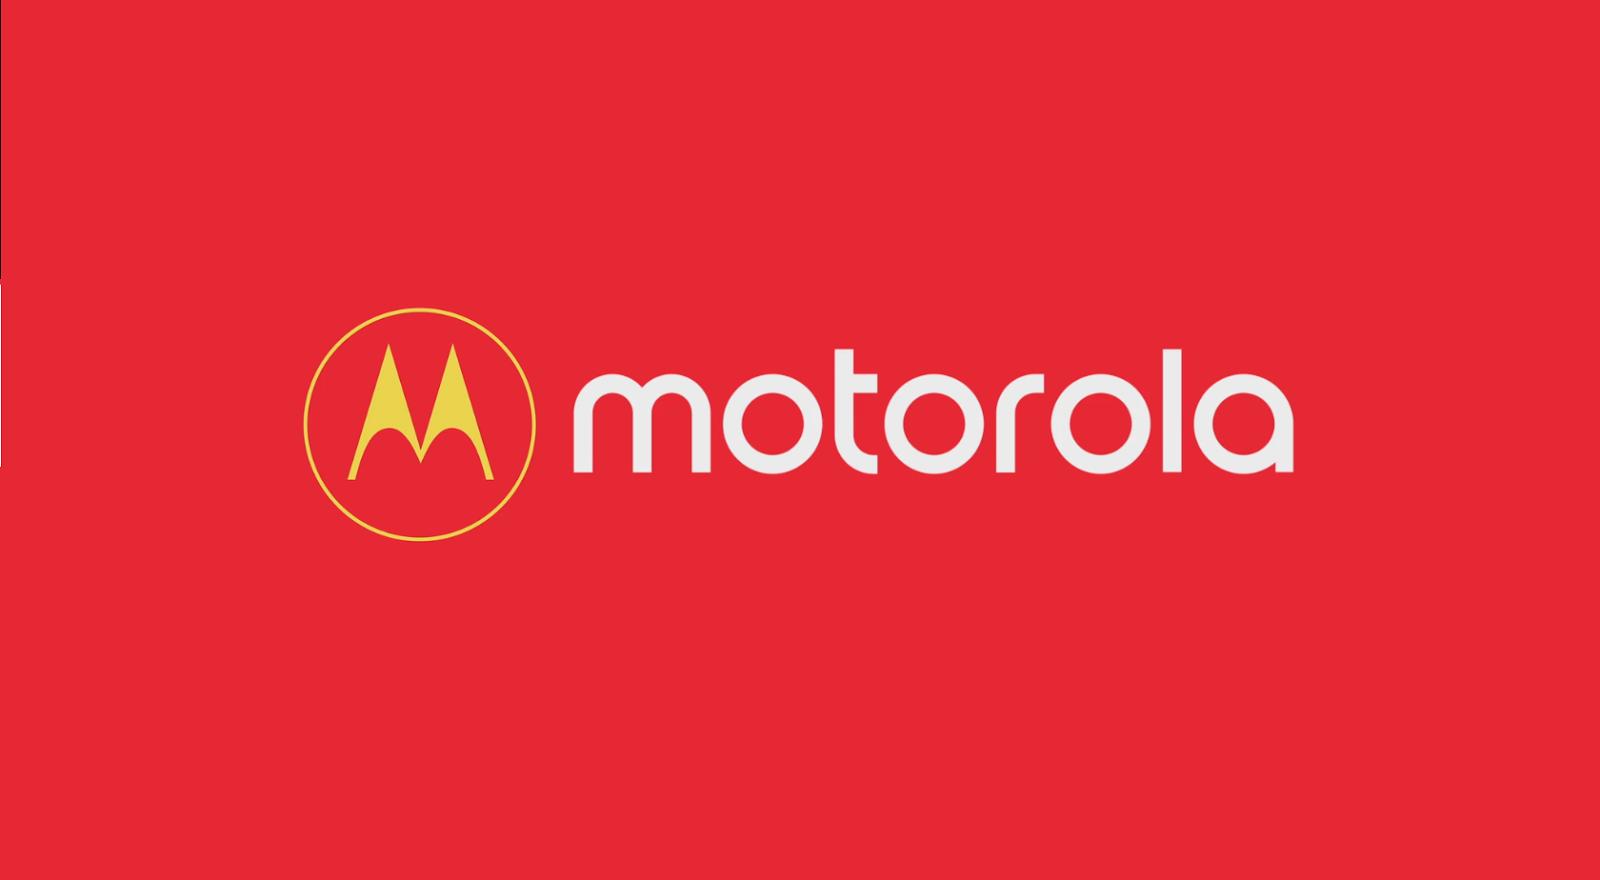 Motorola E6 releasedatum